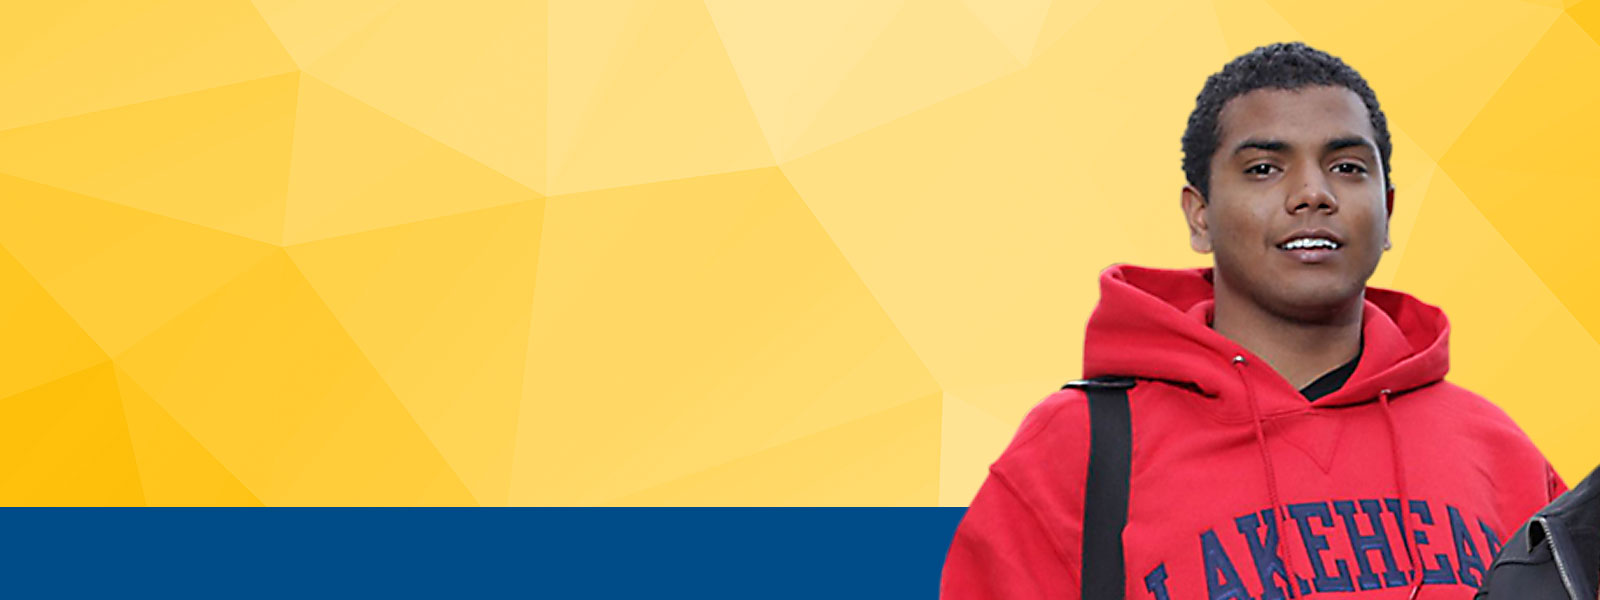 Smiling student wearing red Lakehead hoodie